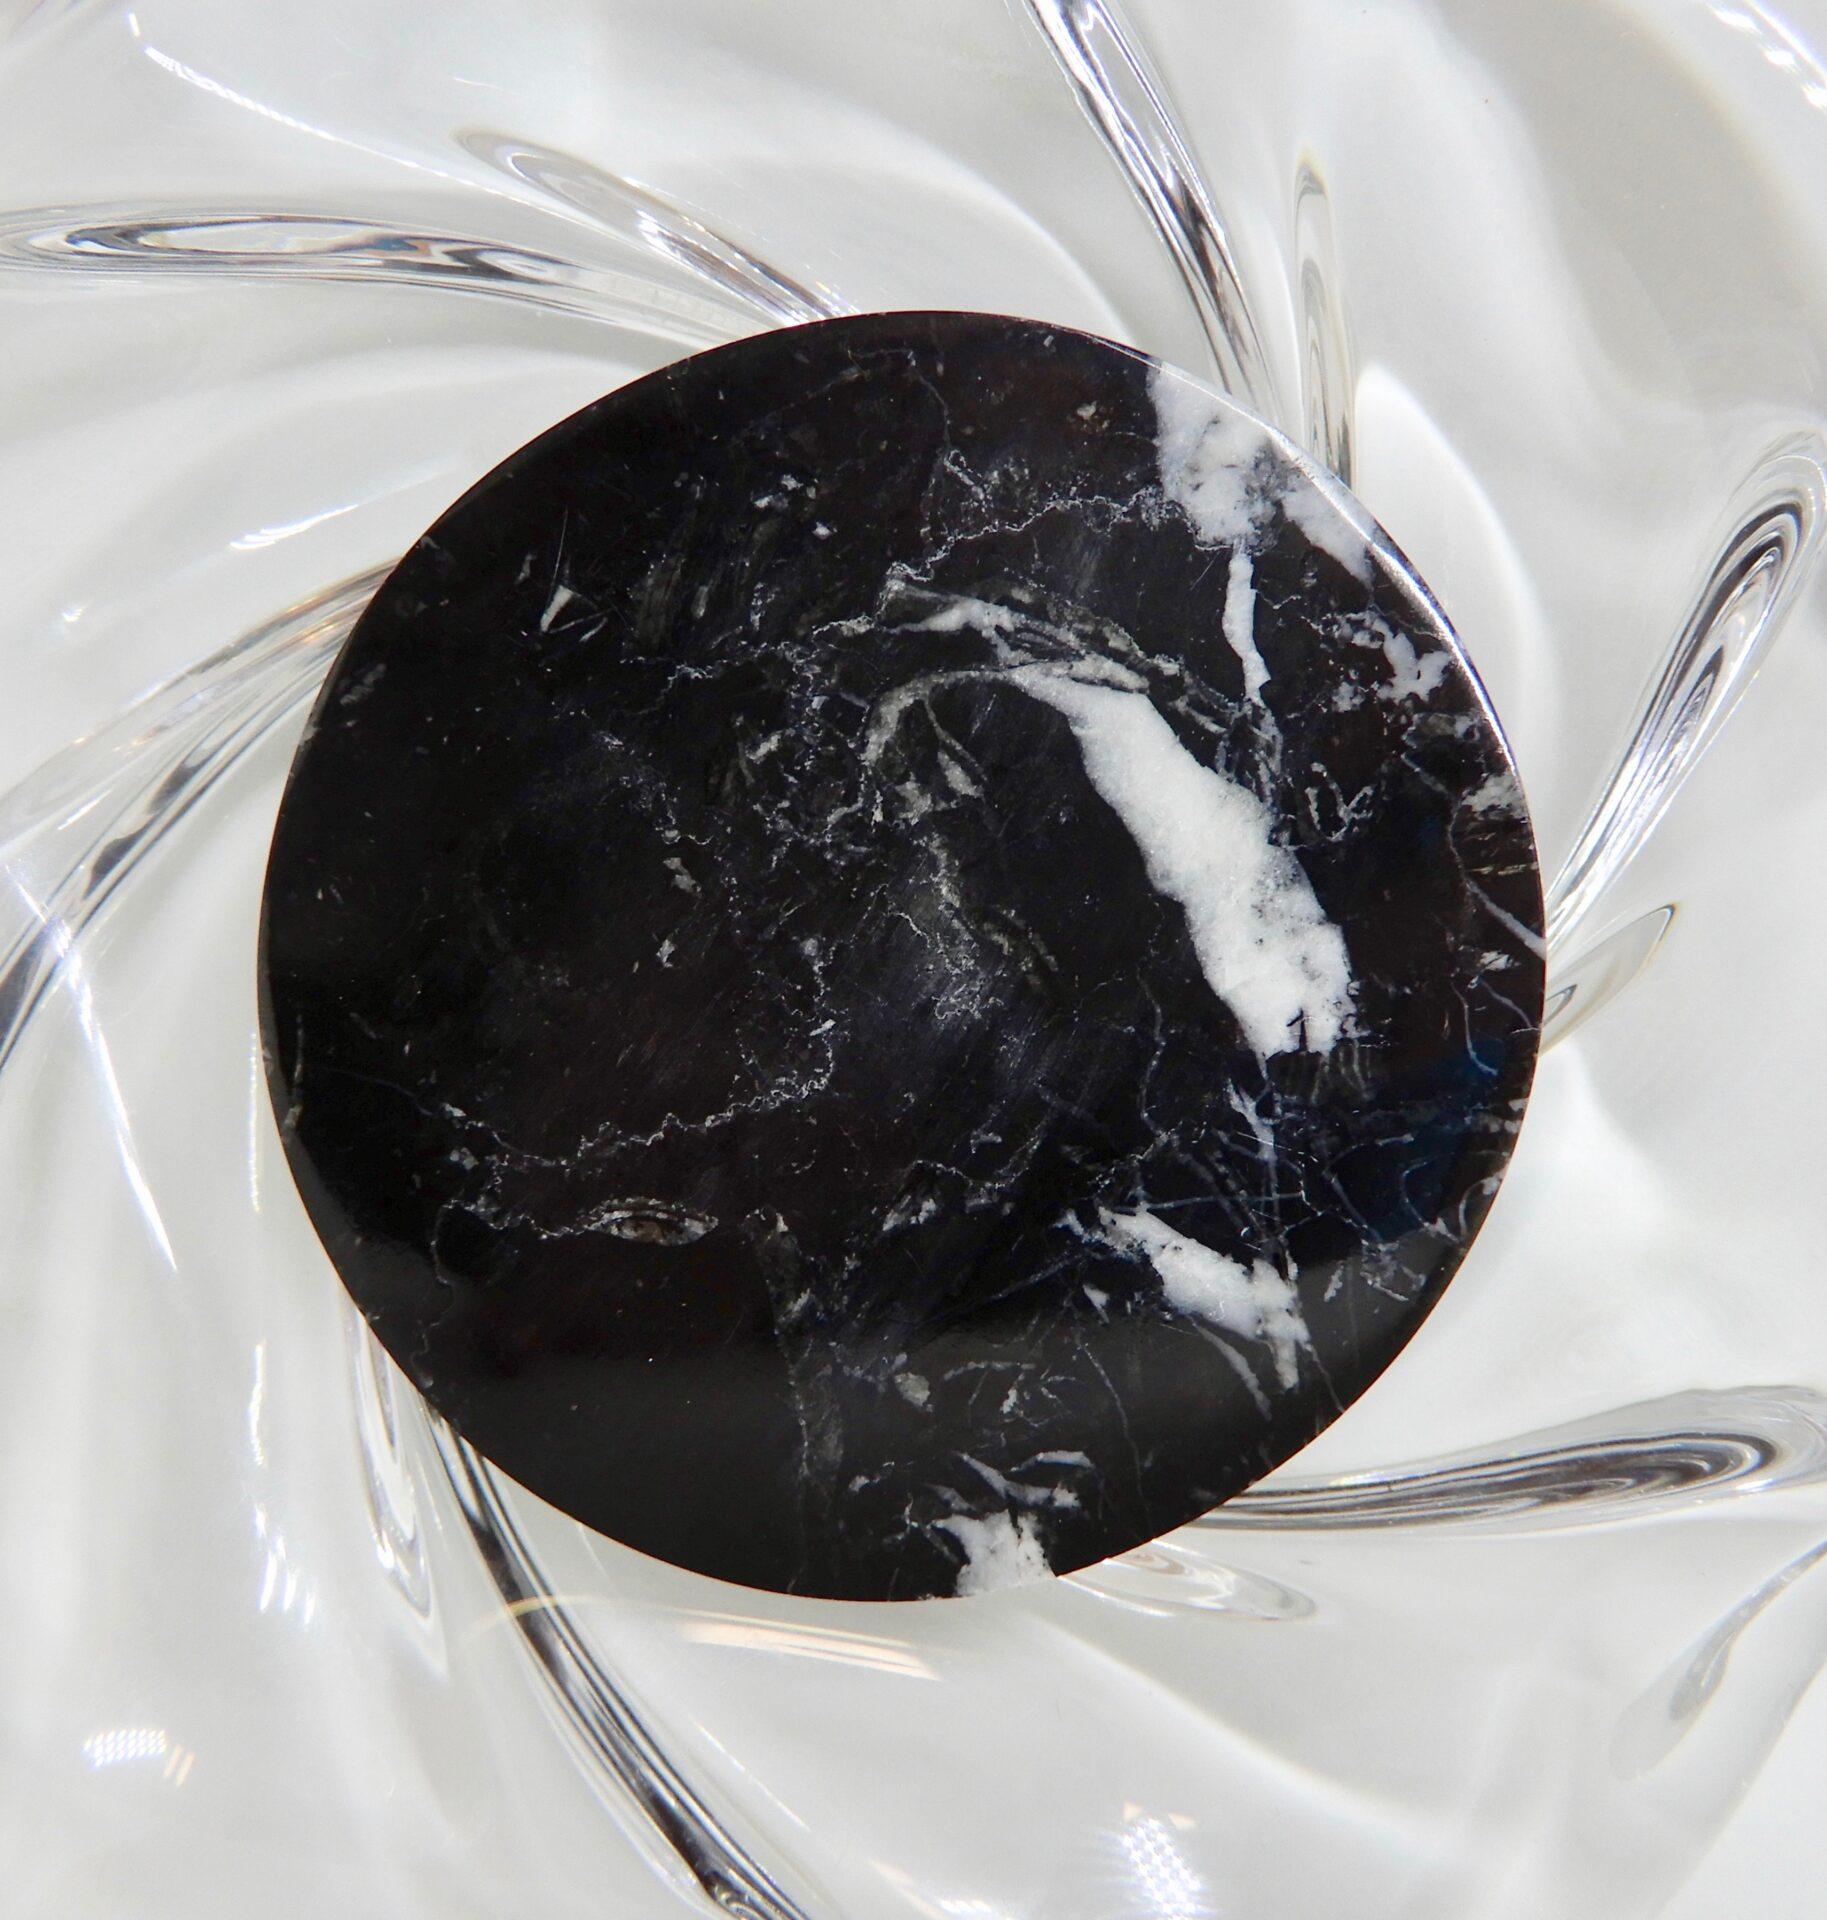 BLACKCOASTER